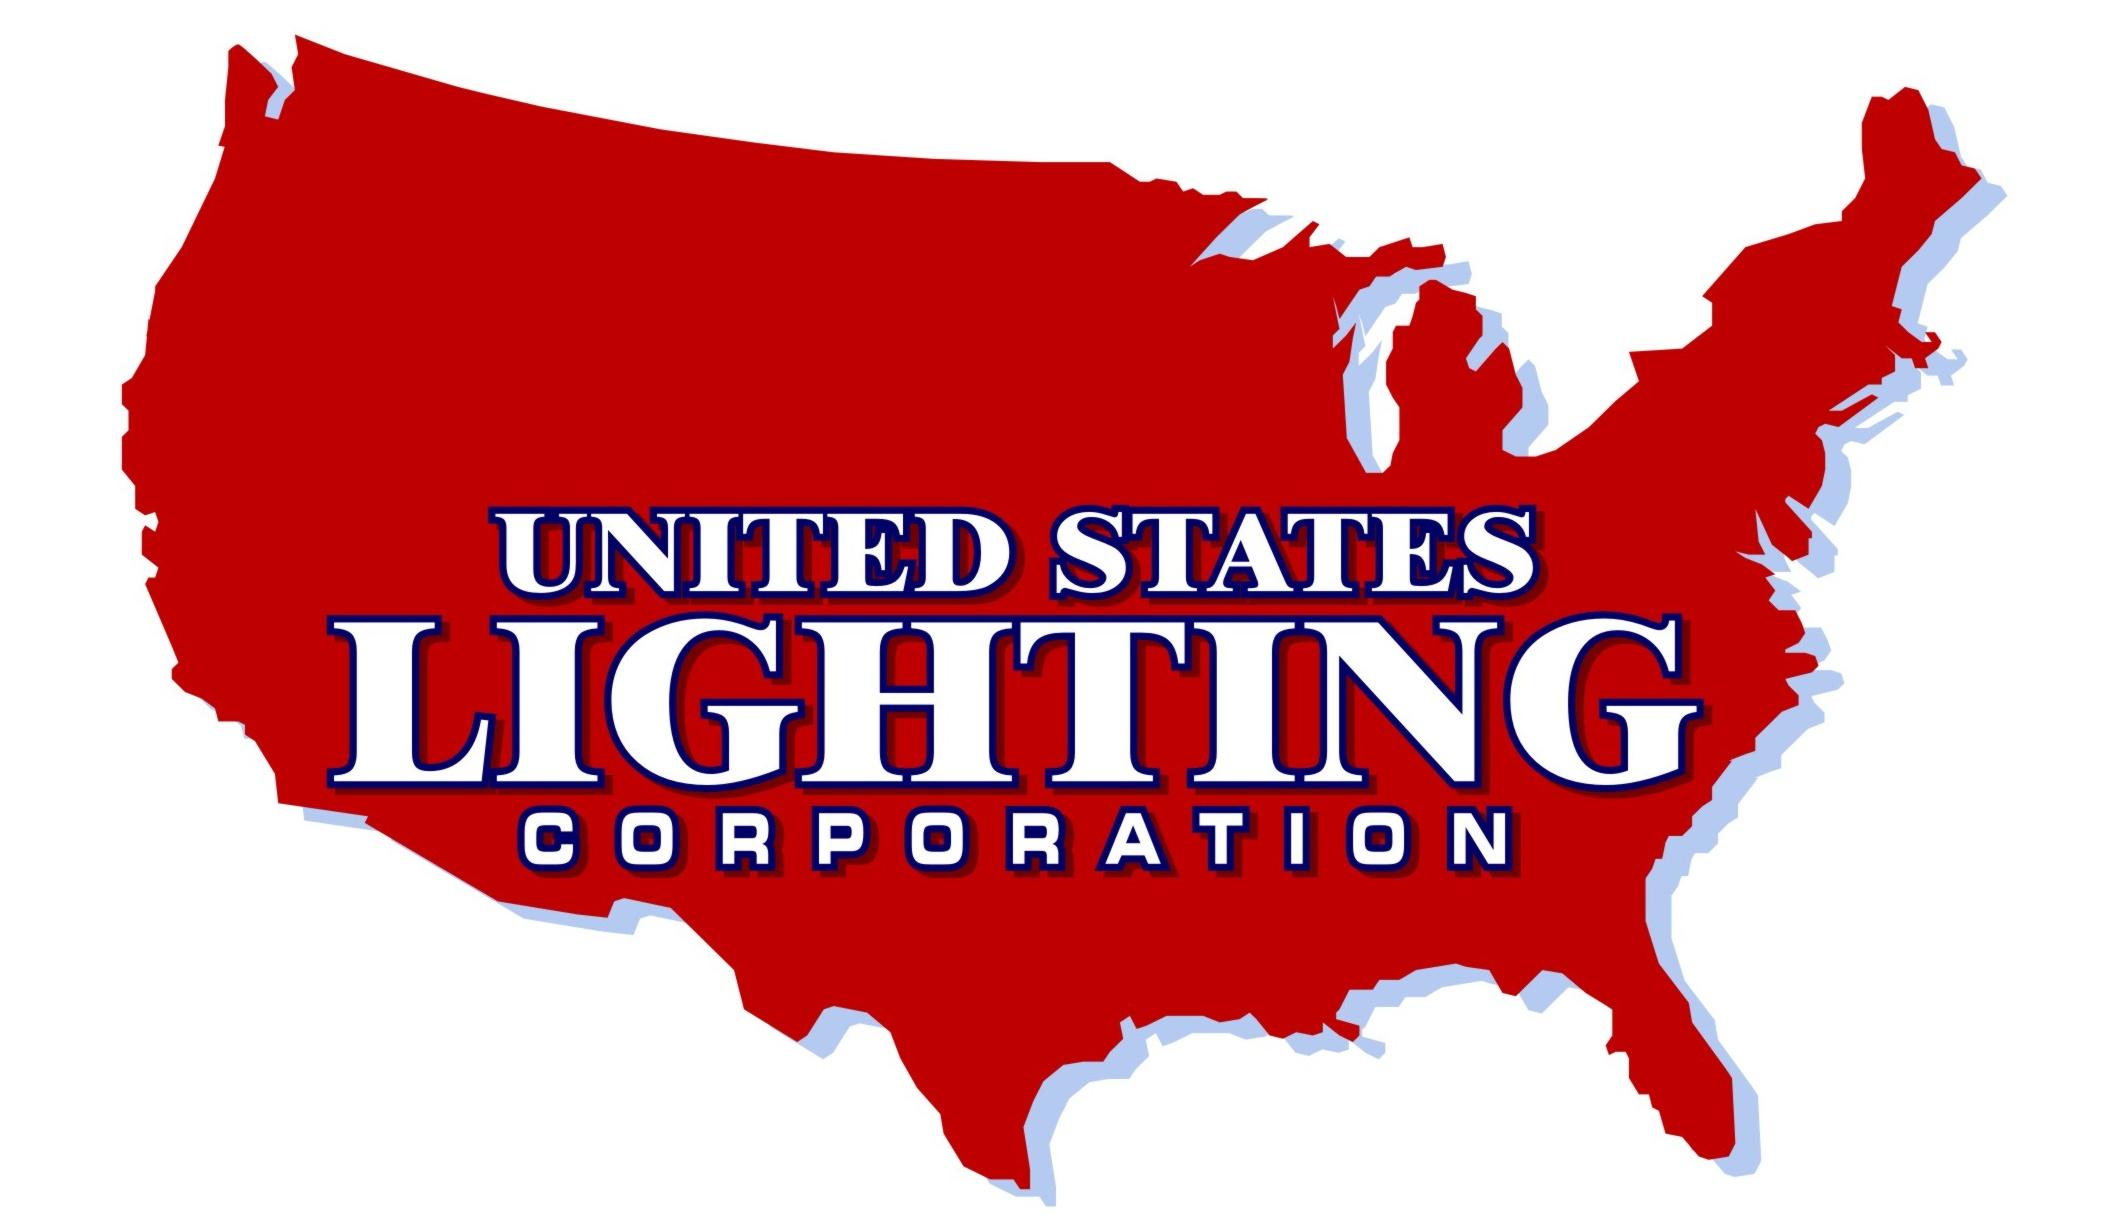 United States Lighting Corporation